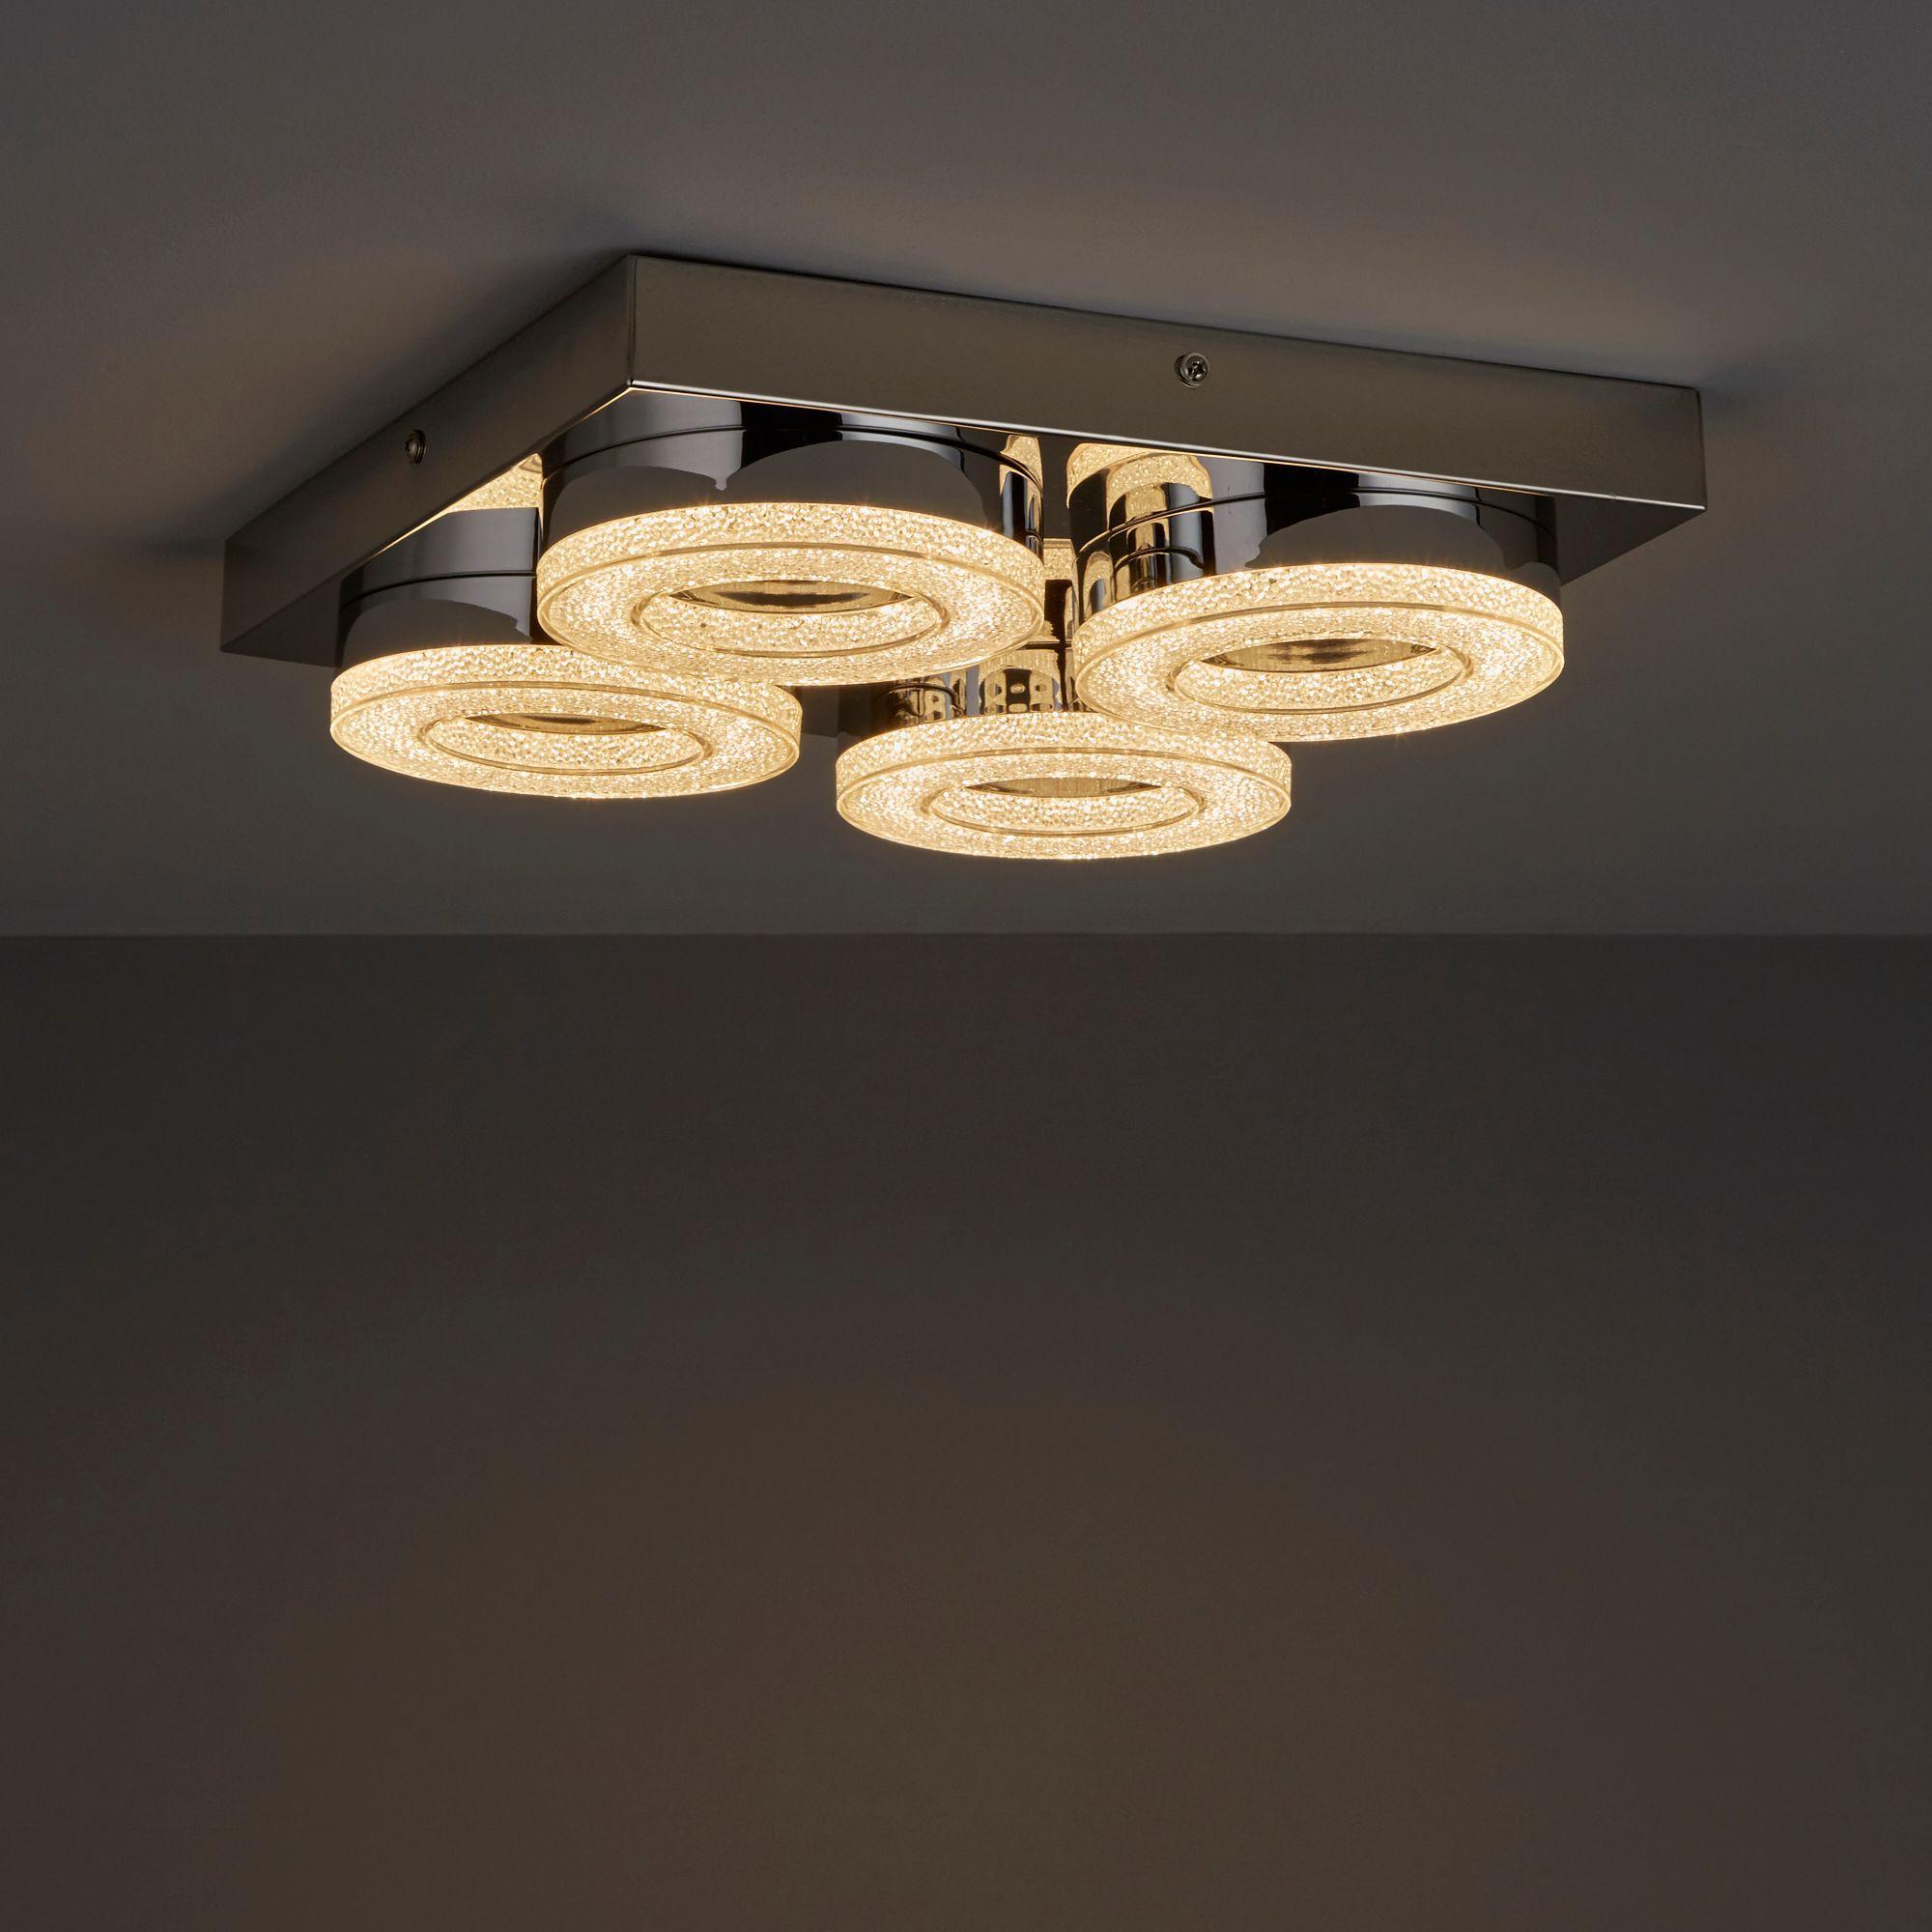 Perna Chrome Effect Ceiling Light